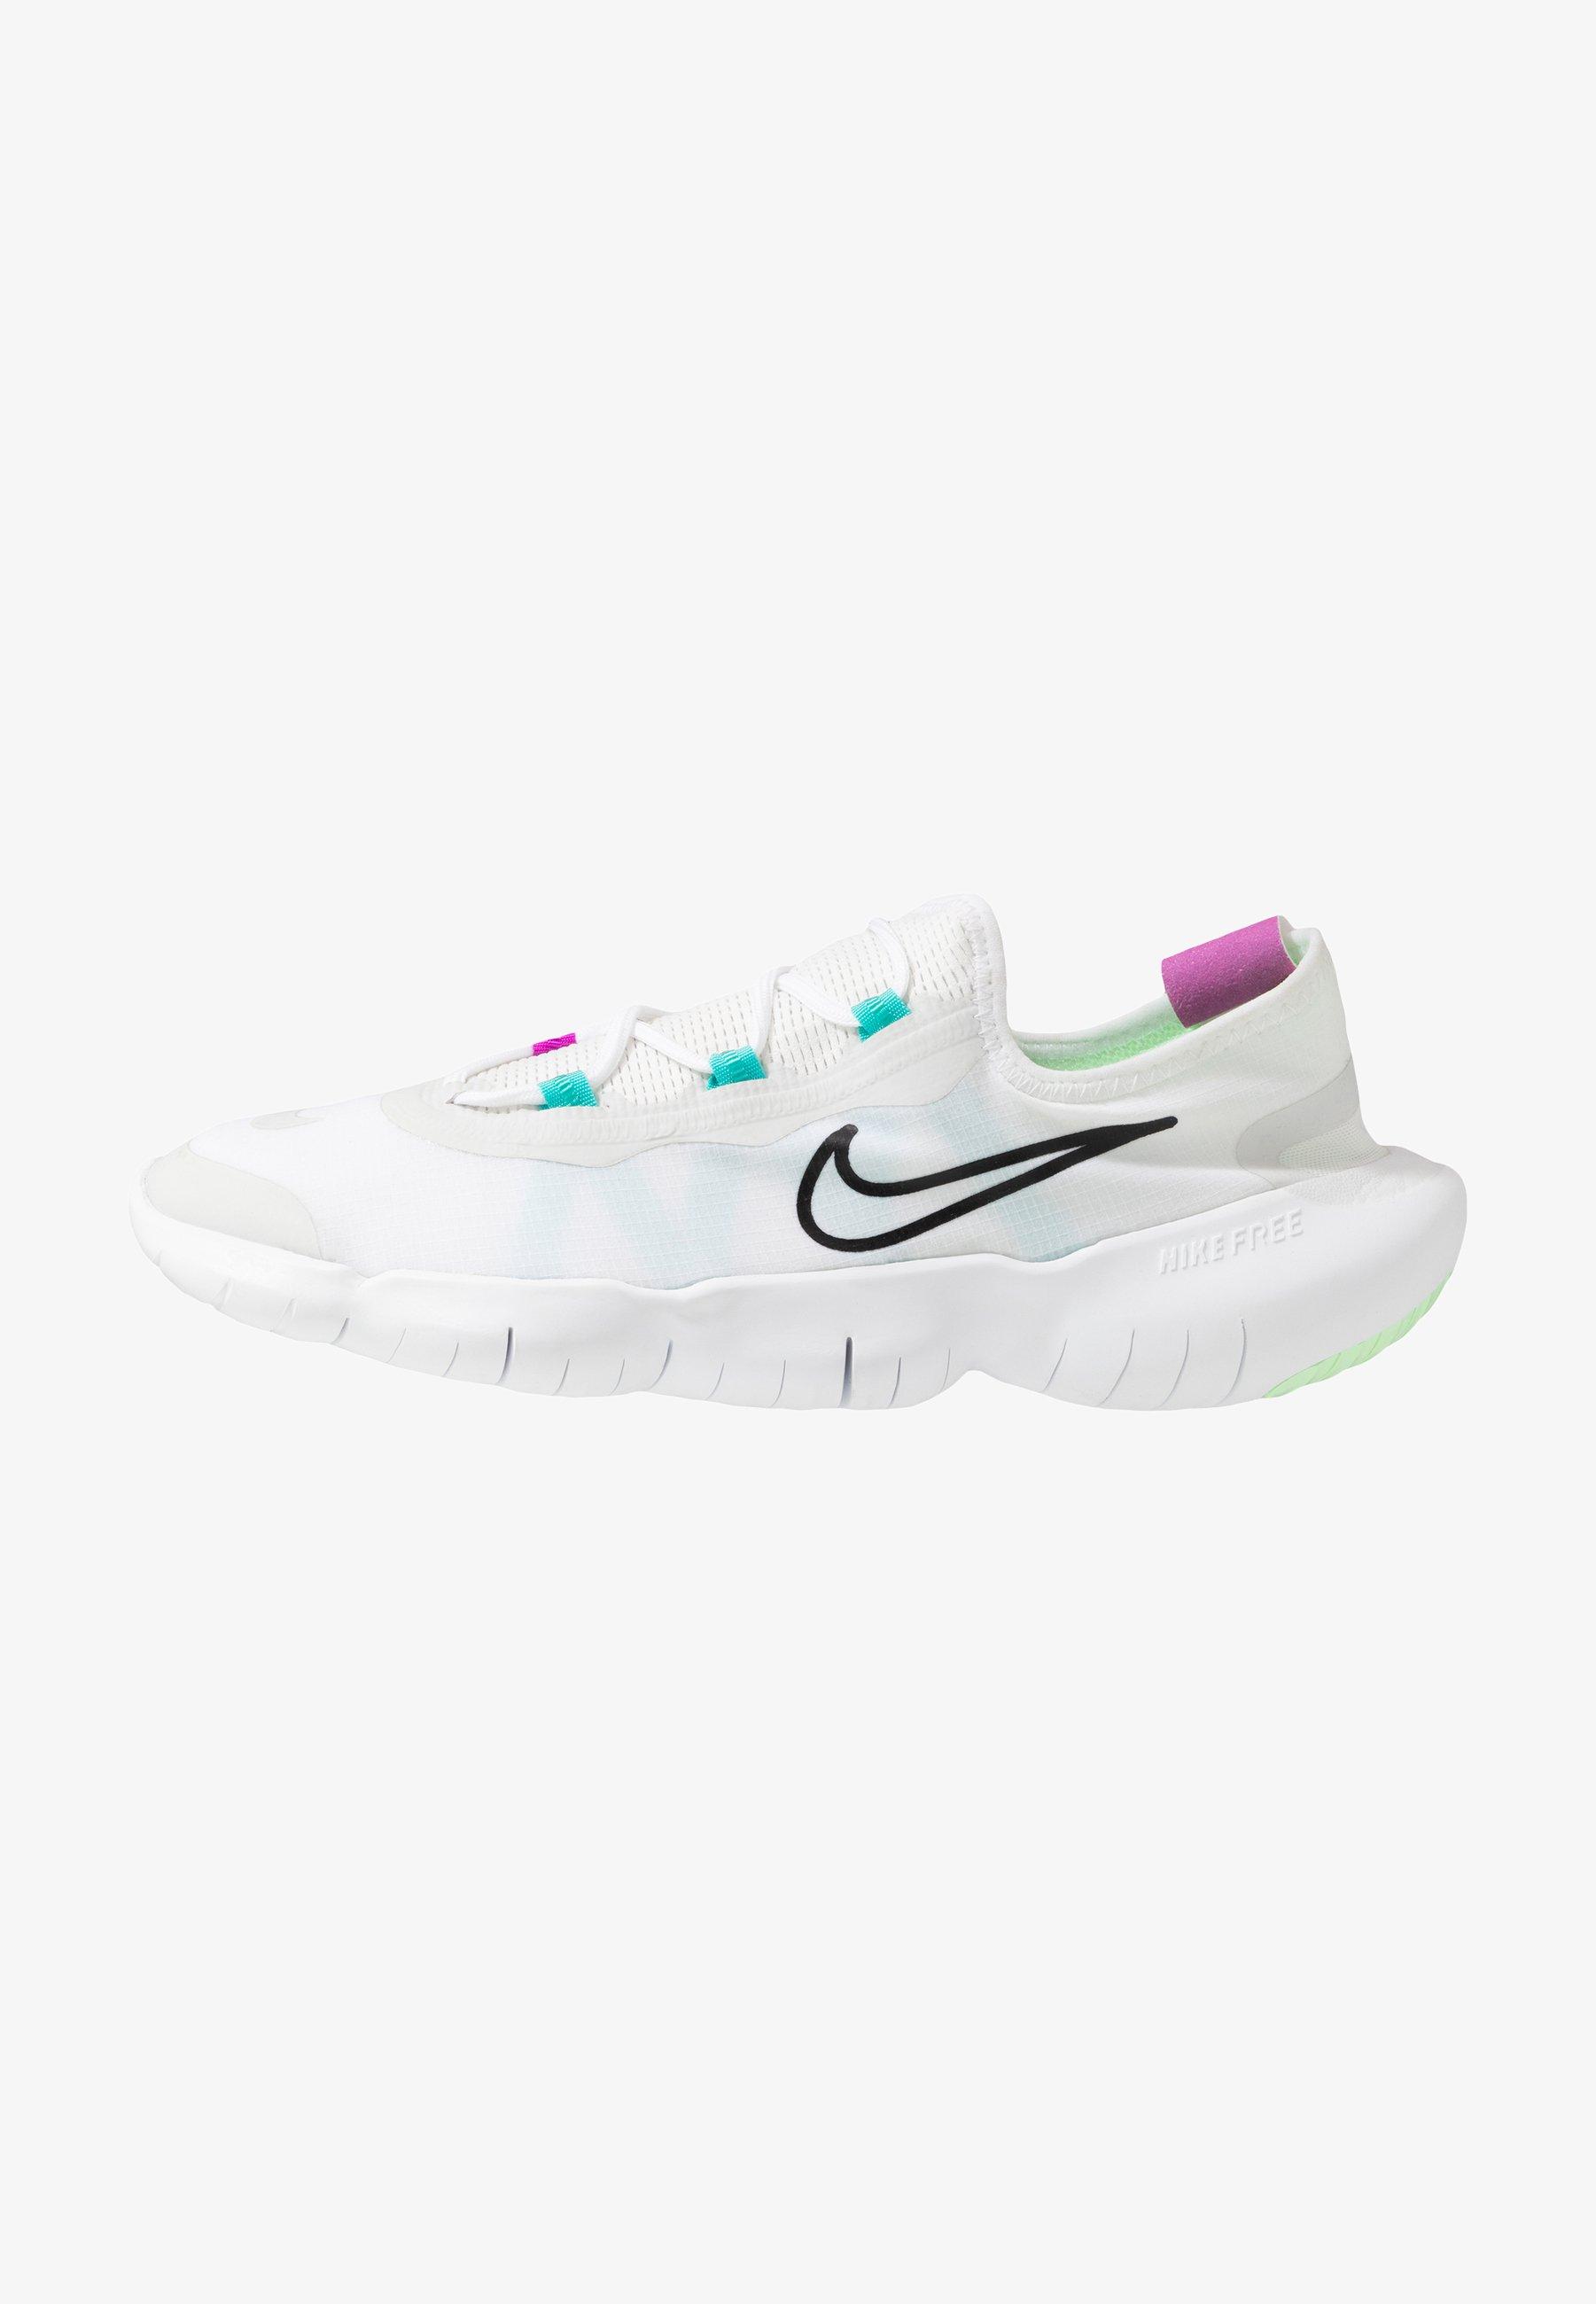 borroso Cap Vatio  Nike Performance FREE RN 5.0 2020 - Minimalist running shoes -  white/black/summit white/white - Zalando.co.uk